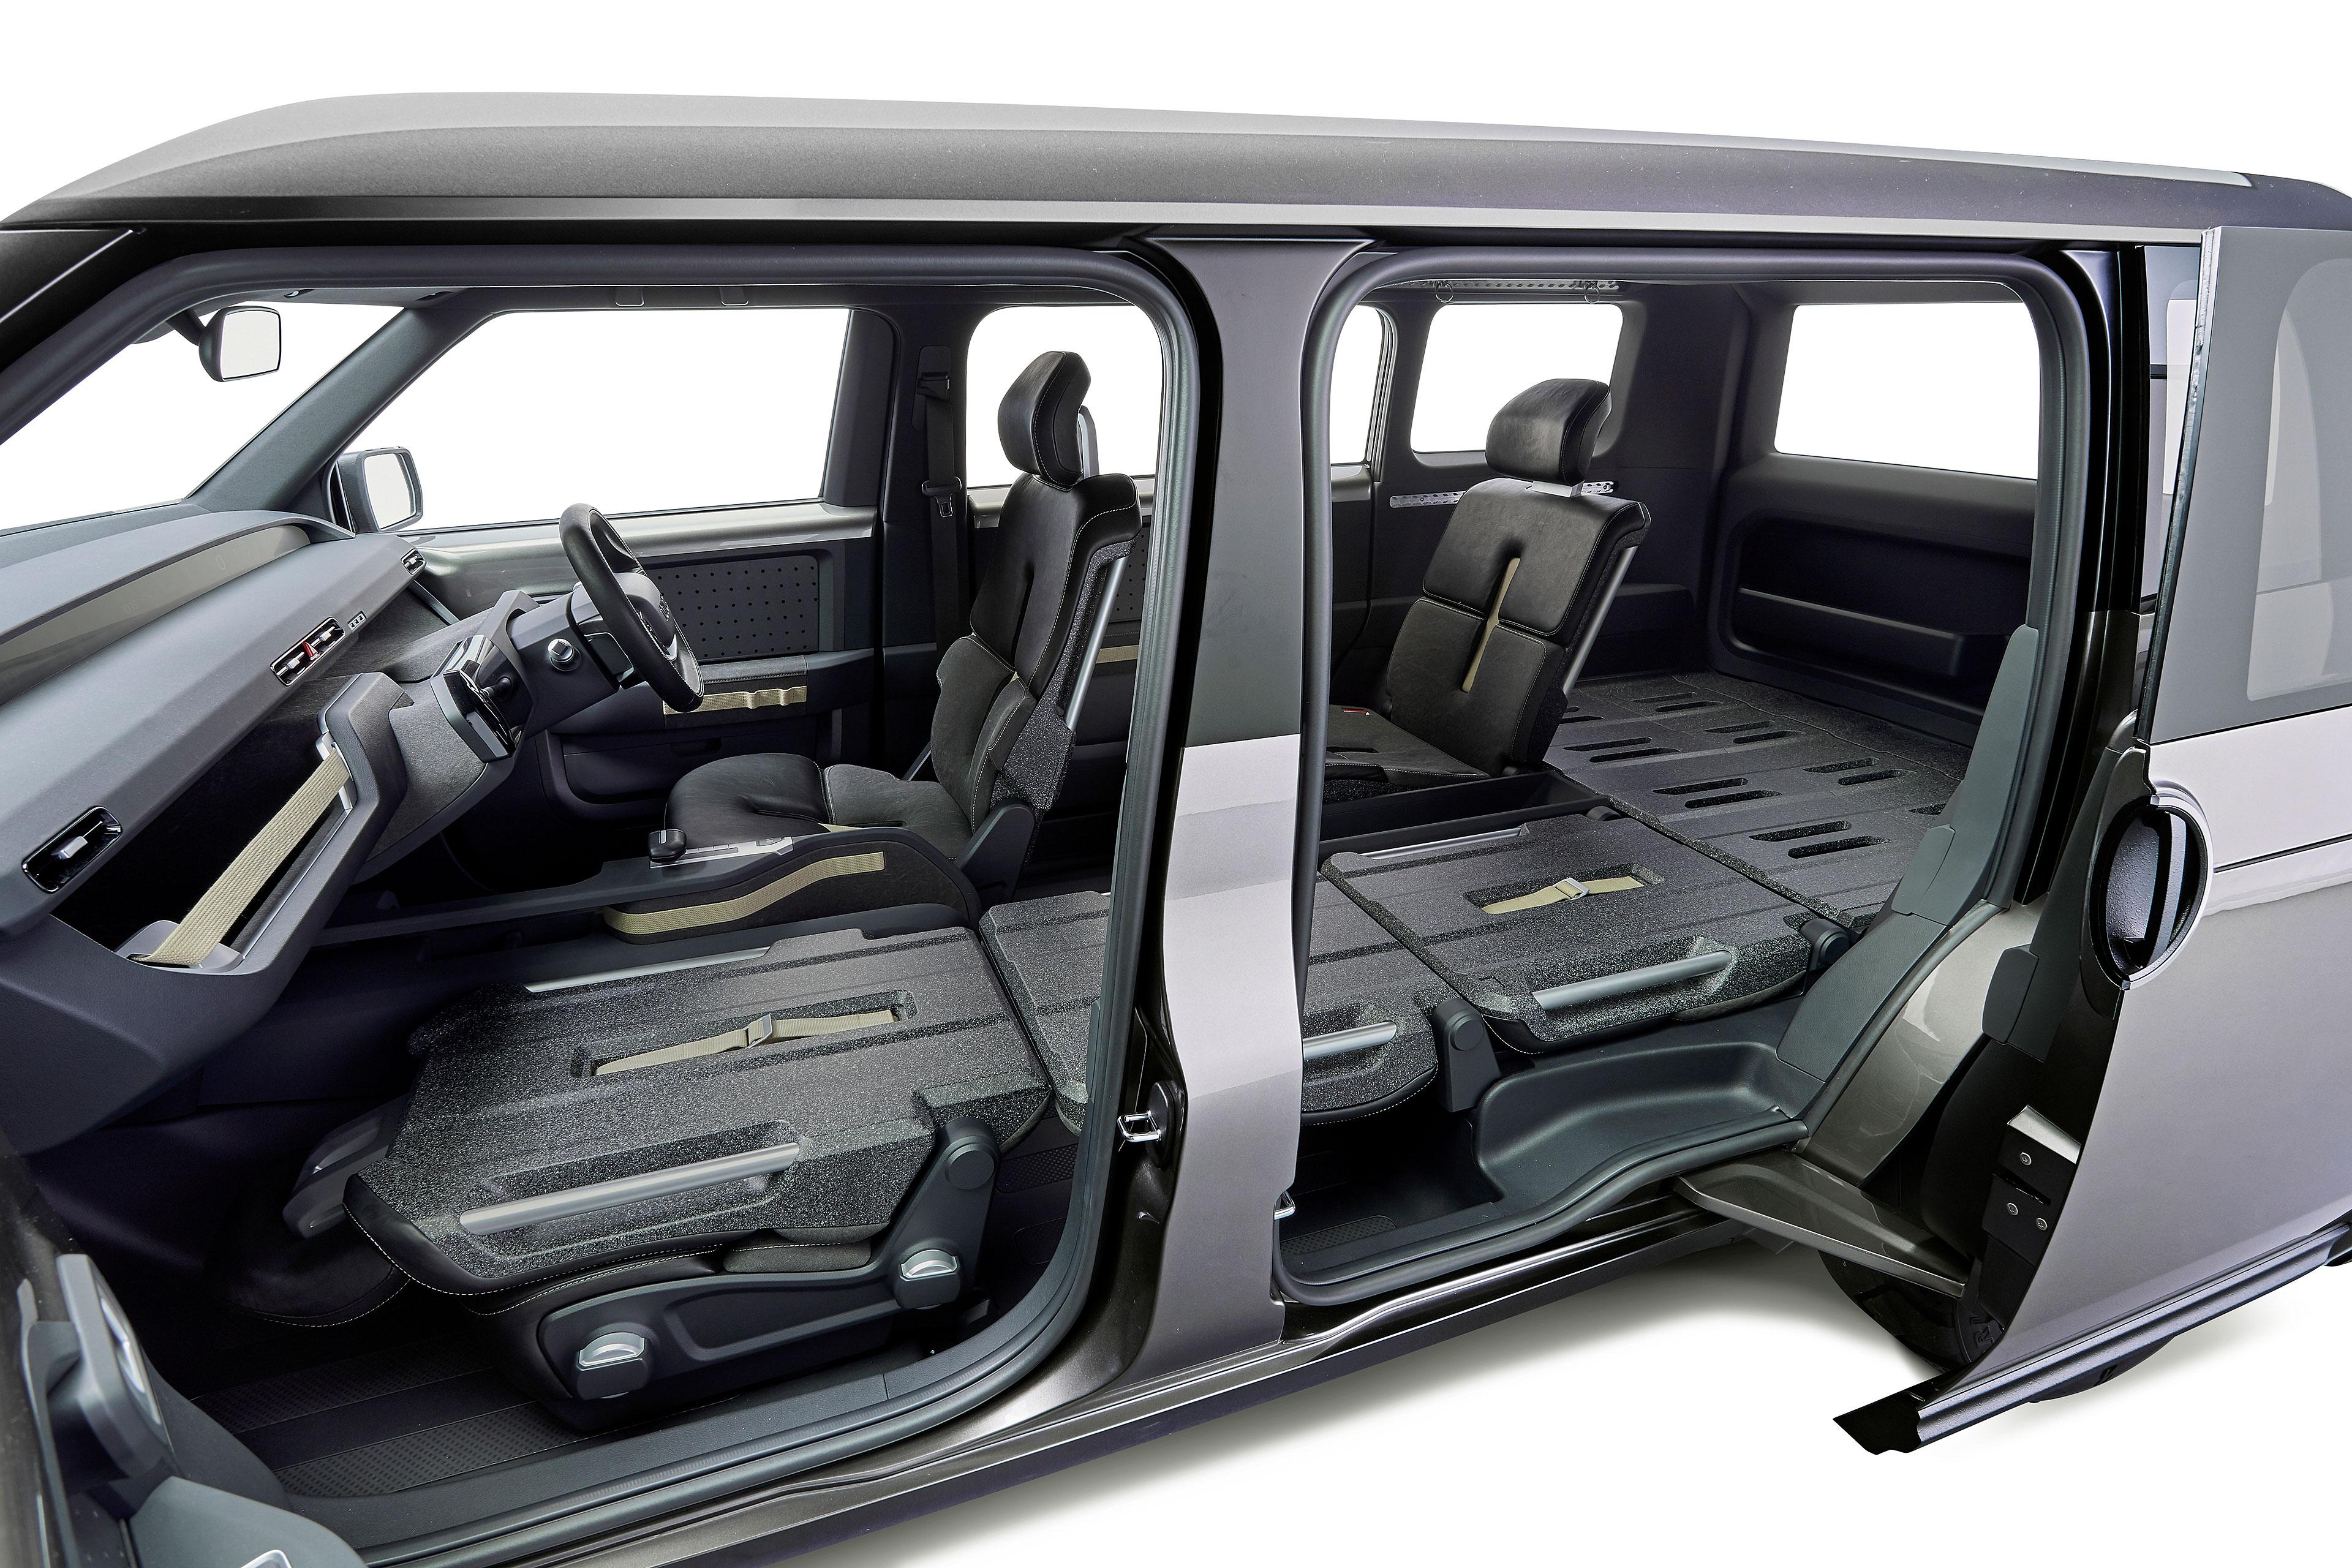 Toyota S Toolbox Concept Sport Utility Minivan Gearjunkie